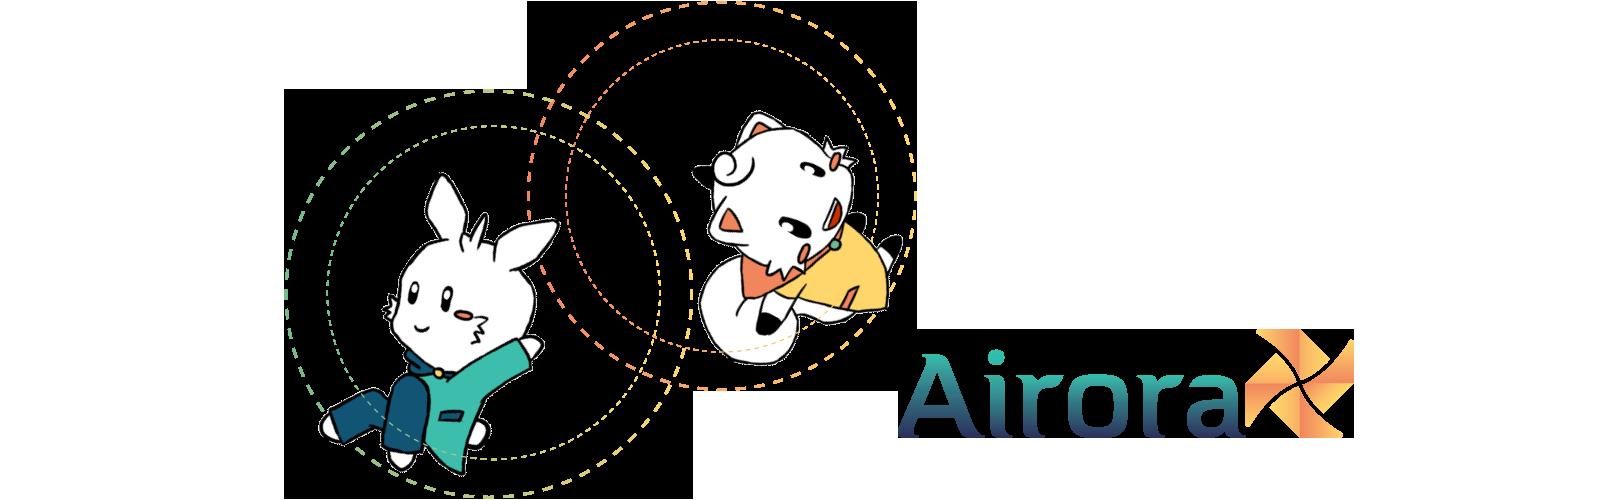 ACWeb_Banner_Airorav1-copy